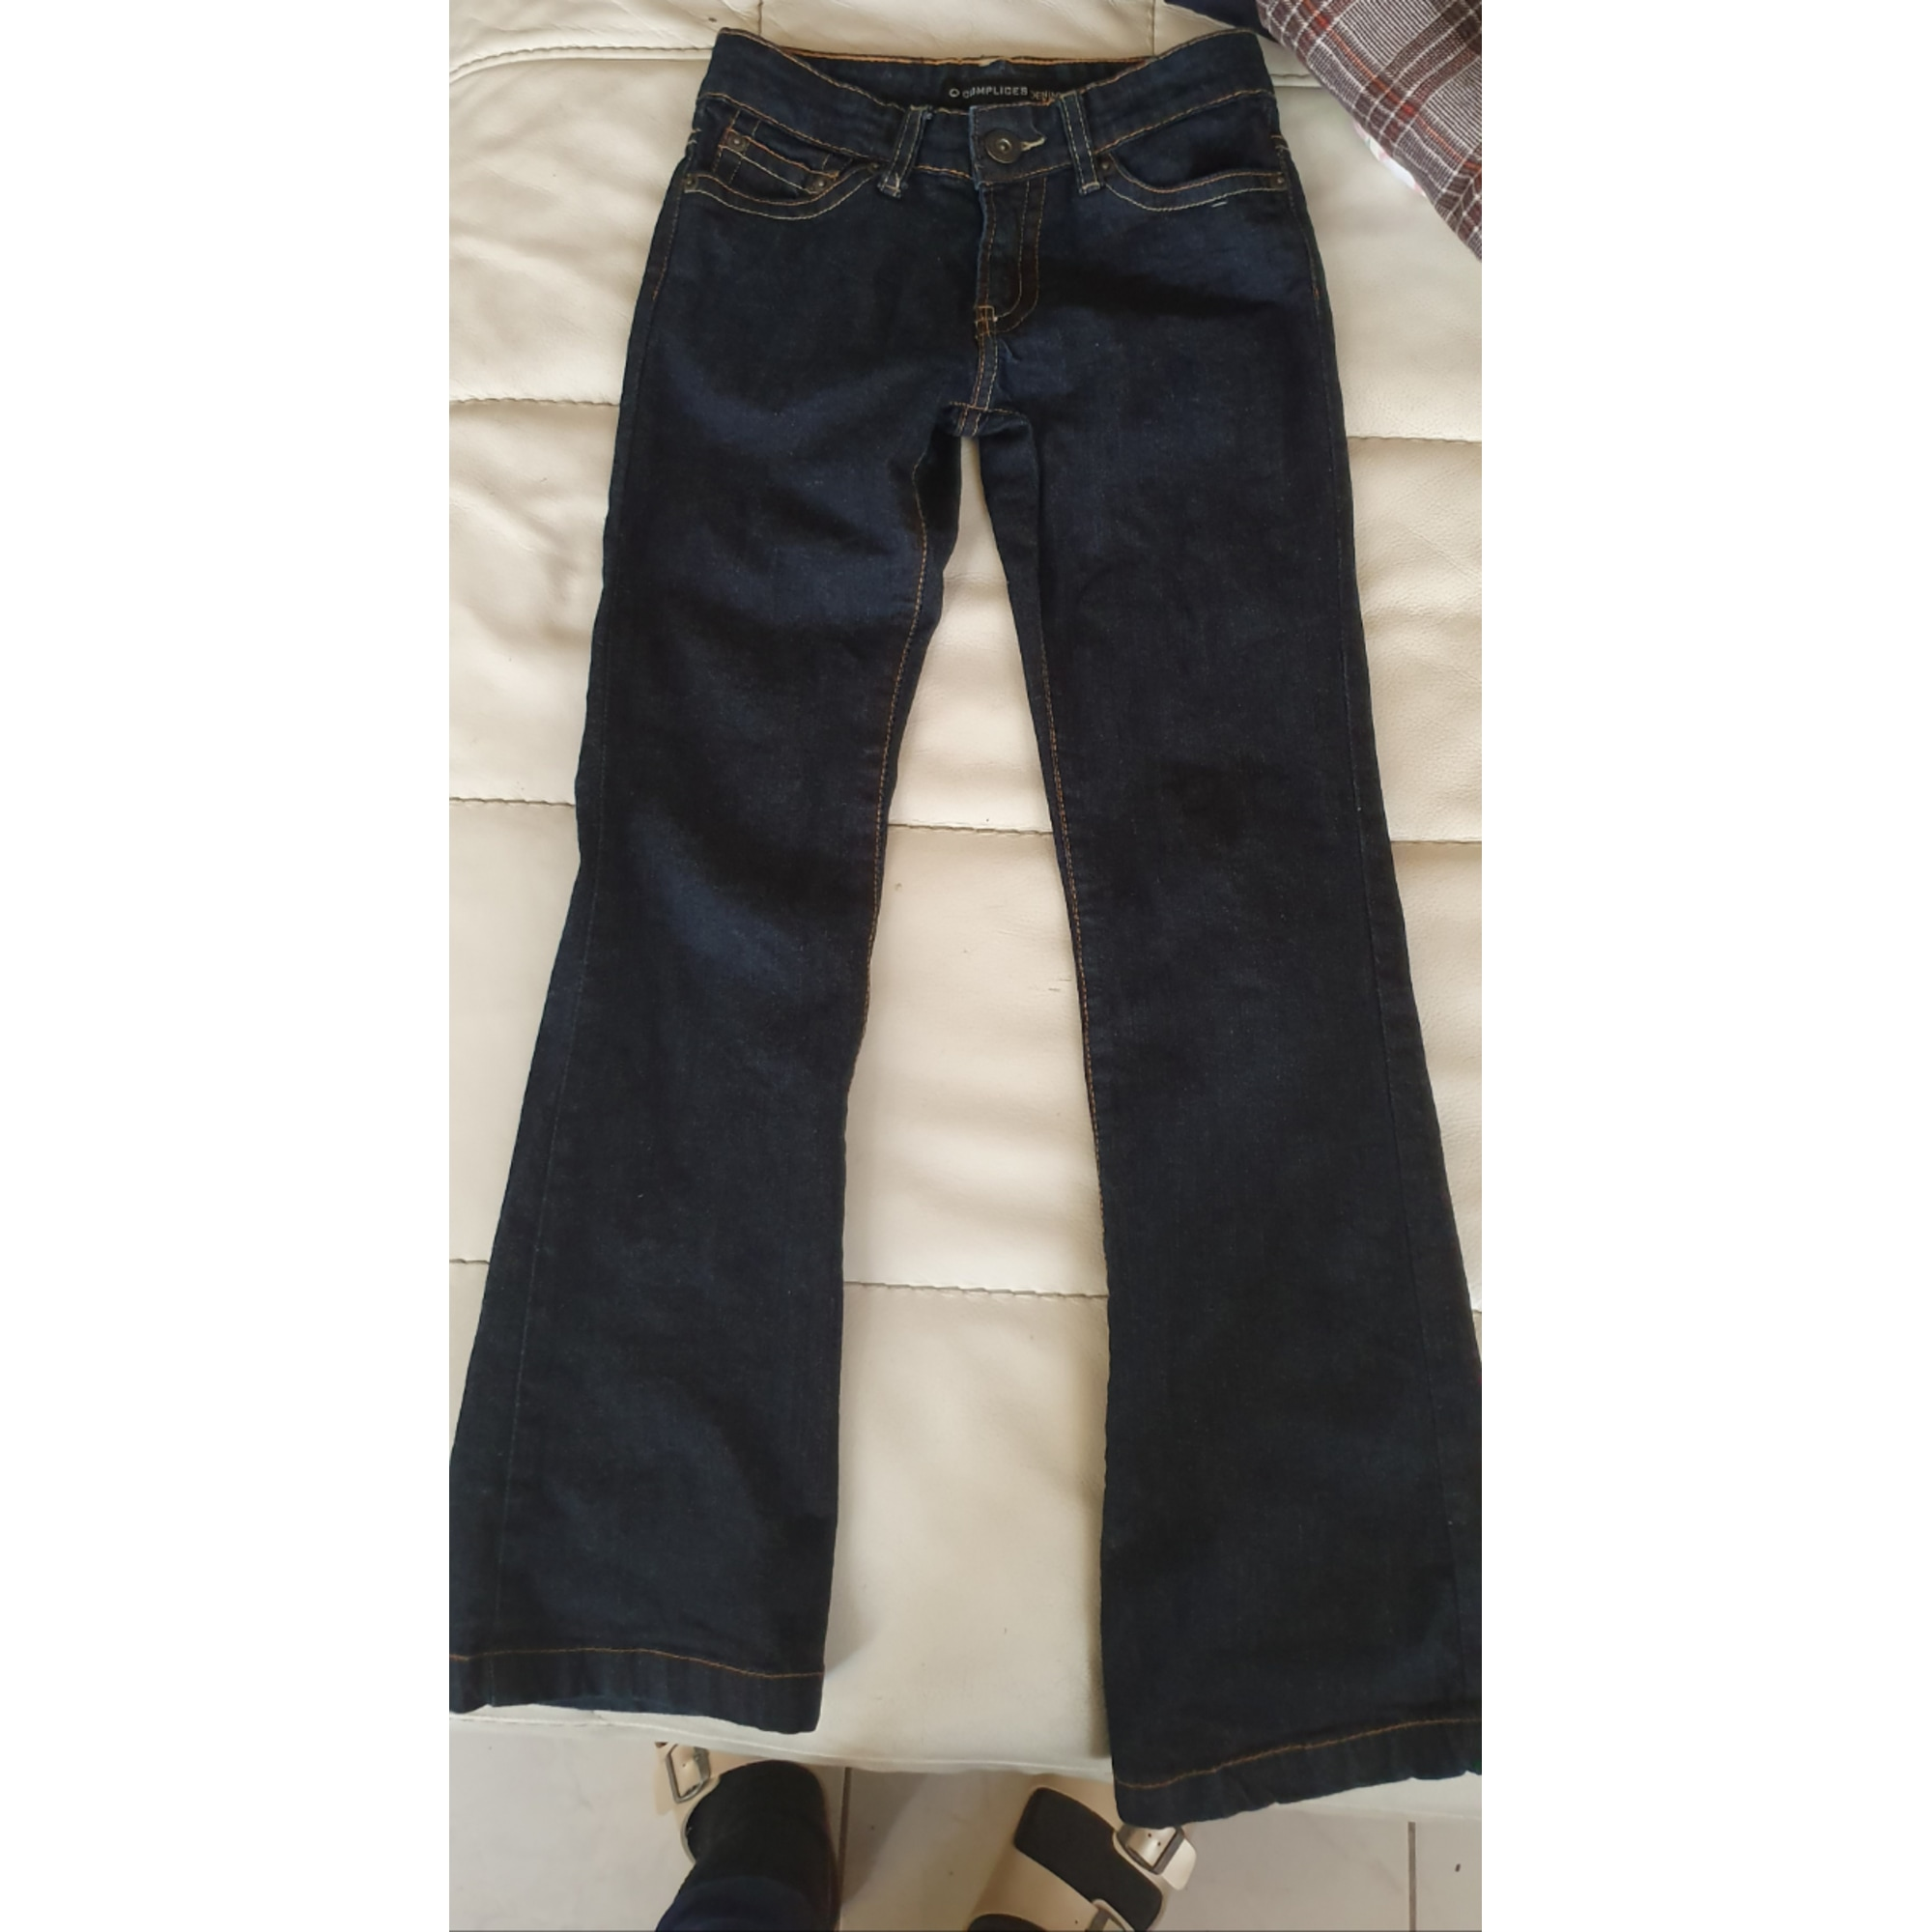 Pantalon COMPLICES Bleu, bleu marine, bleu turquoise